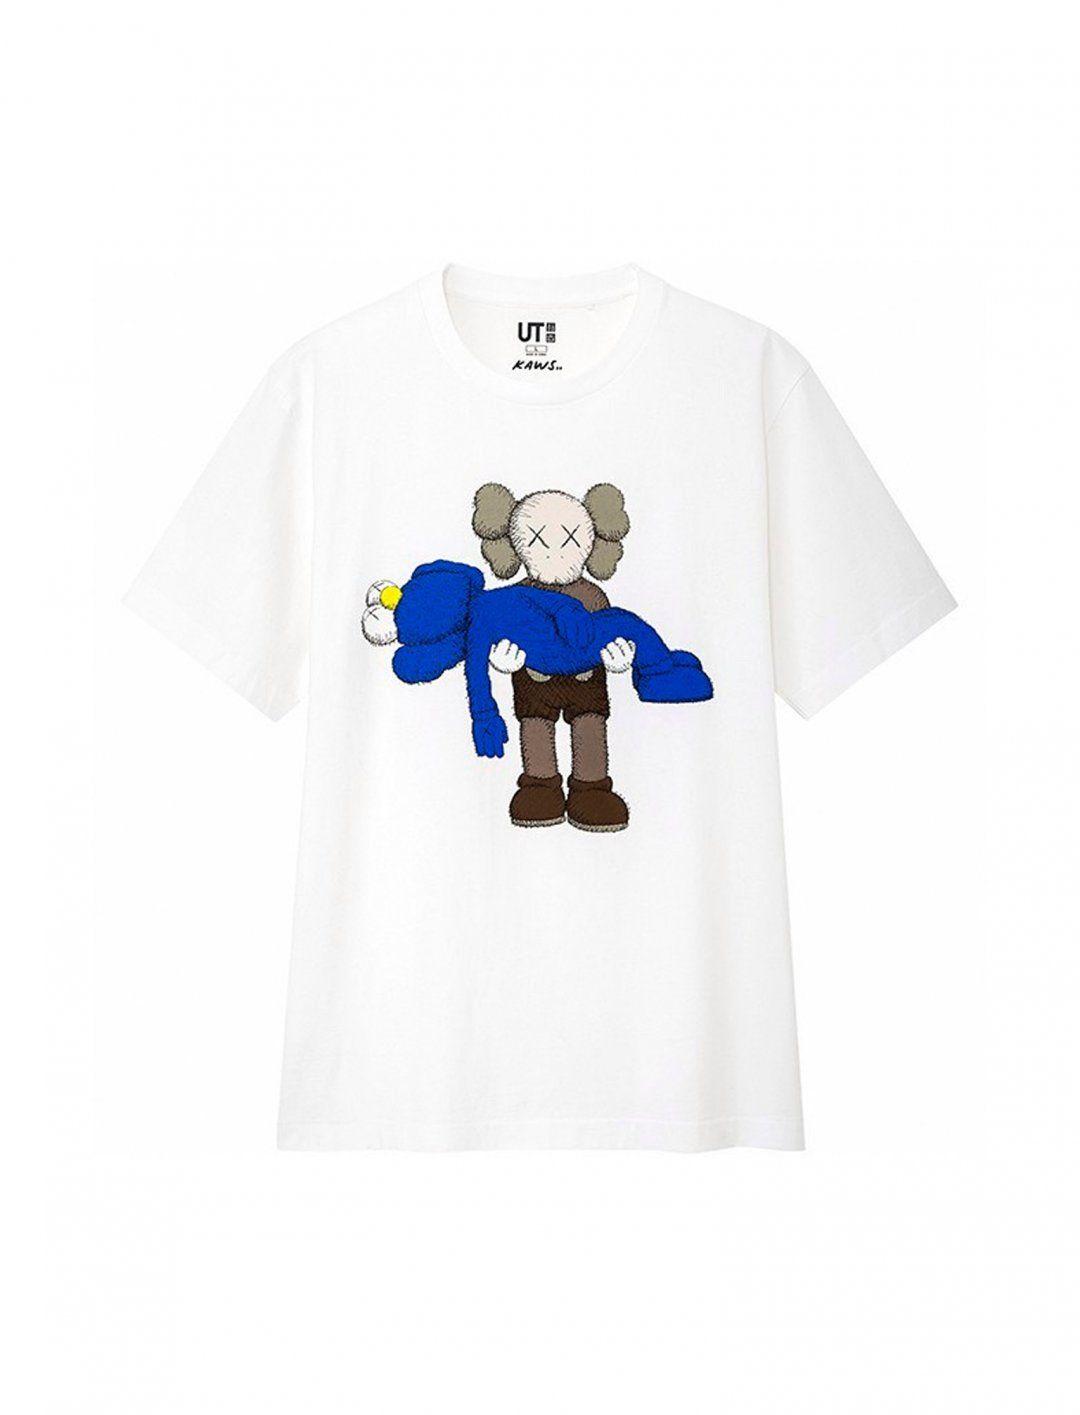 NEW KAWS × UNIQLO UT Summer UNIQLO 2019 XX Men/'s T-Shirt Blue from JAPAN F//S